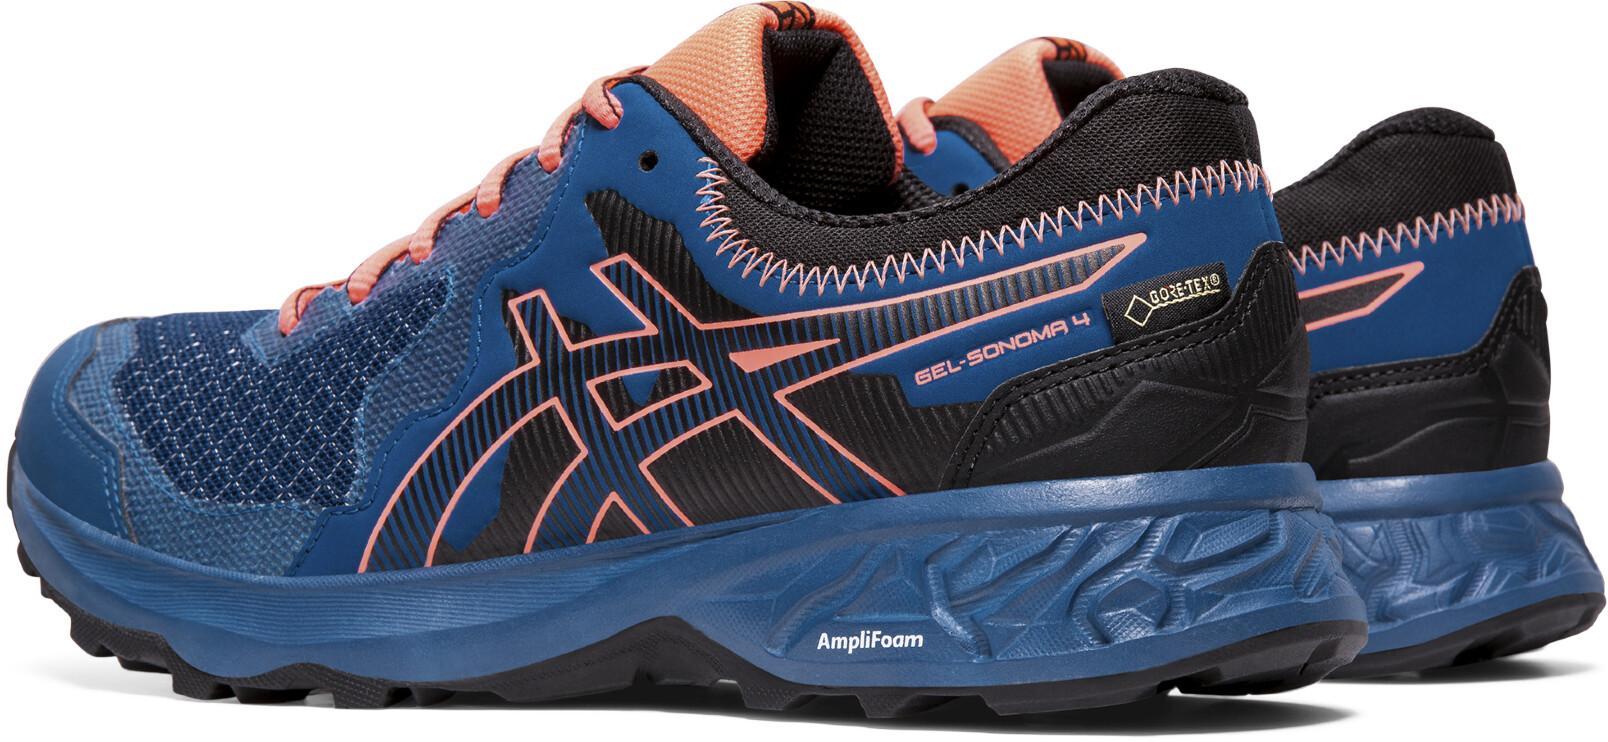 asics Gel Sonoma 4 G TX Schuhe Damen mako bluesun coral